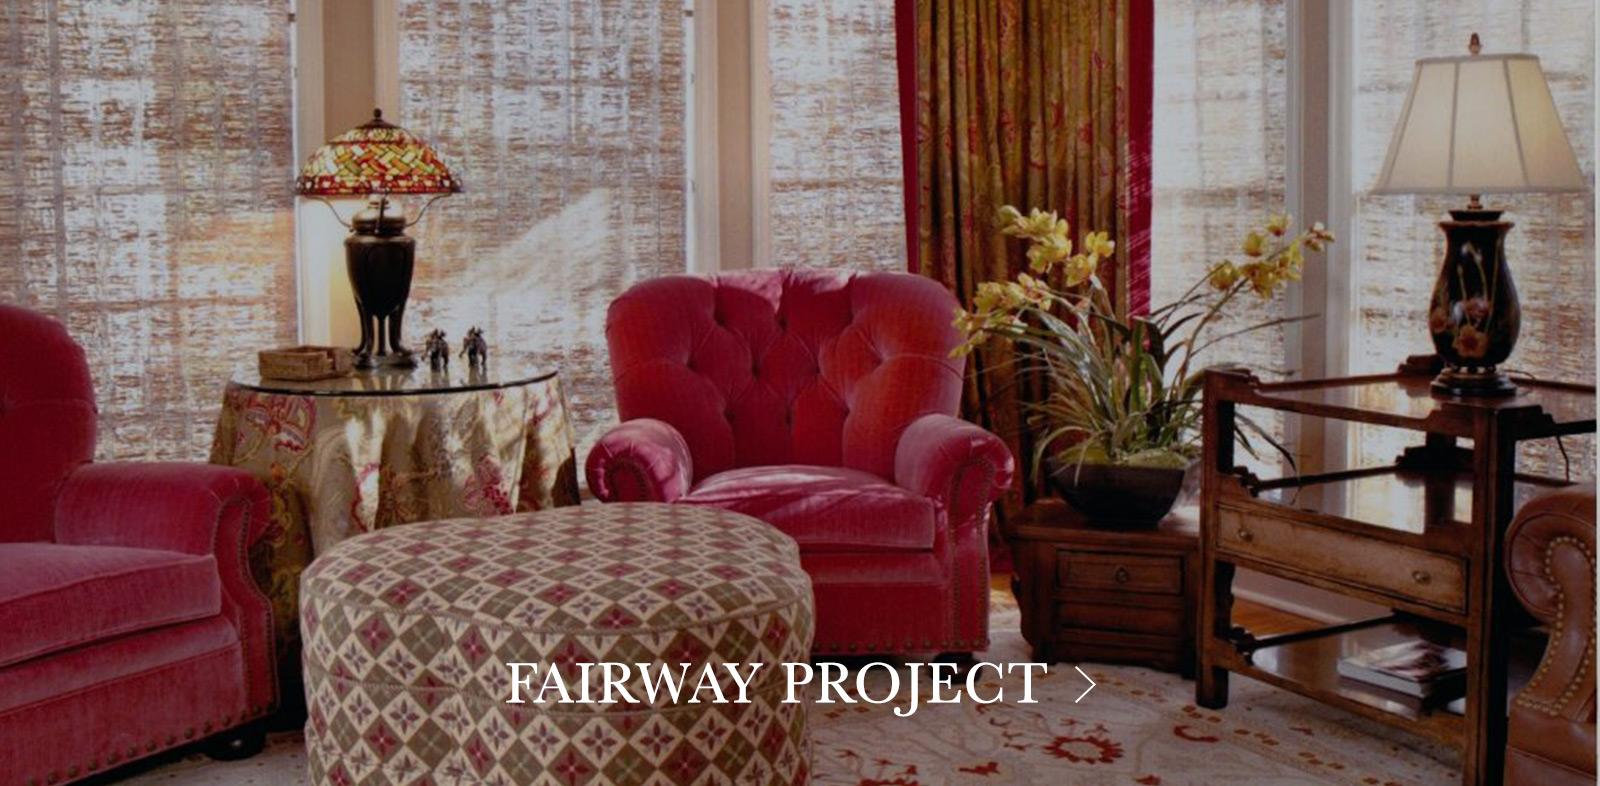 Fairway-Project.jpg